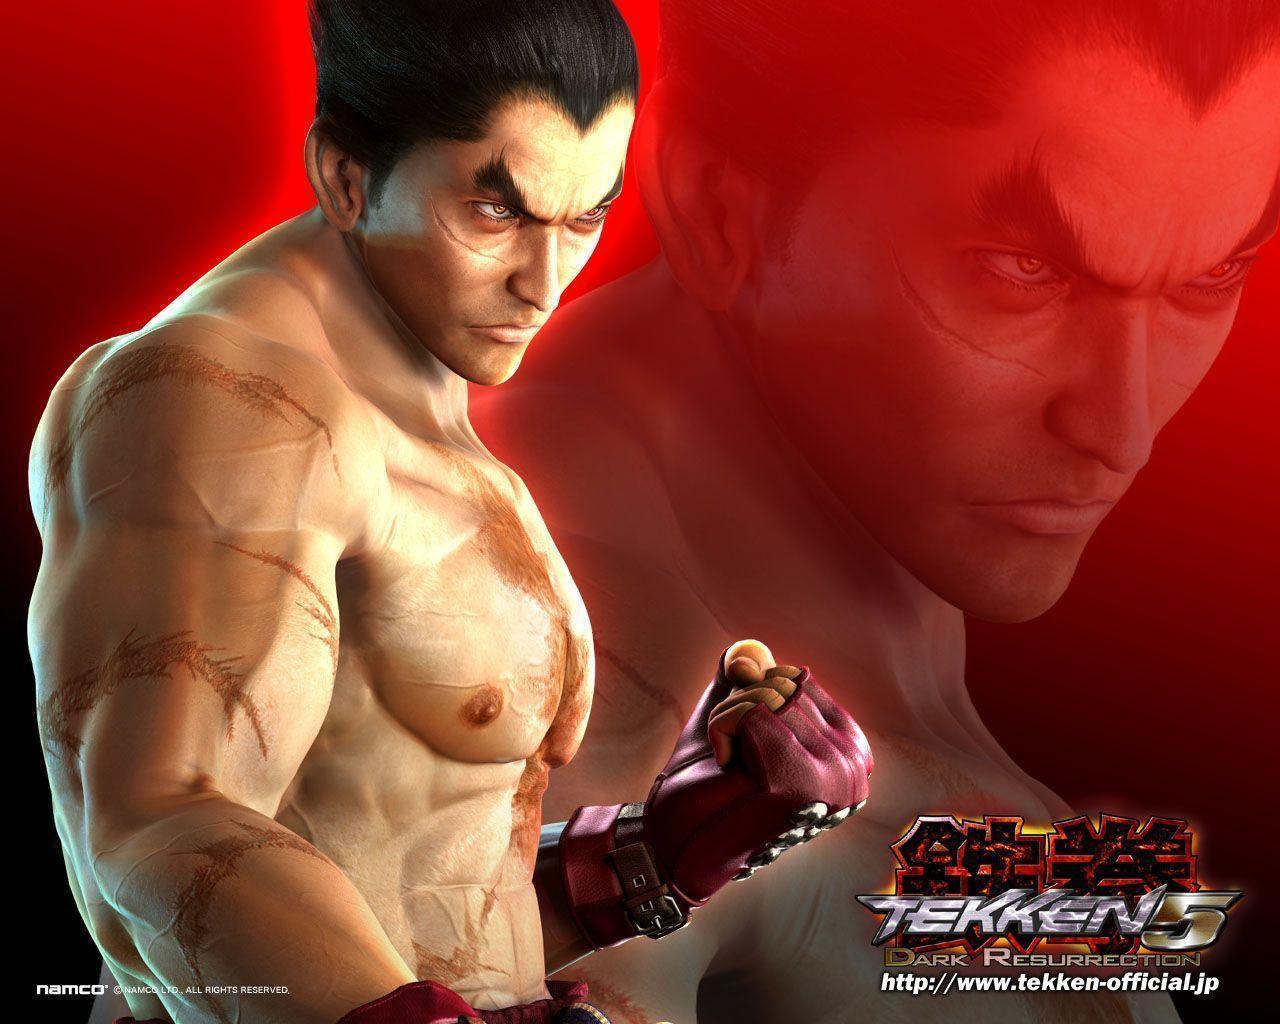 Dark Resurrection Wallpaper - Tekken Wallpaper (243858) - Fanpop